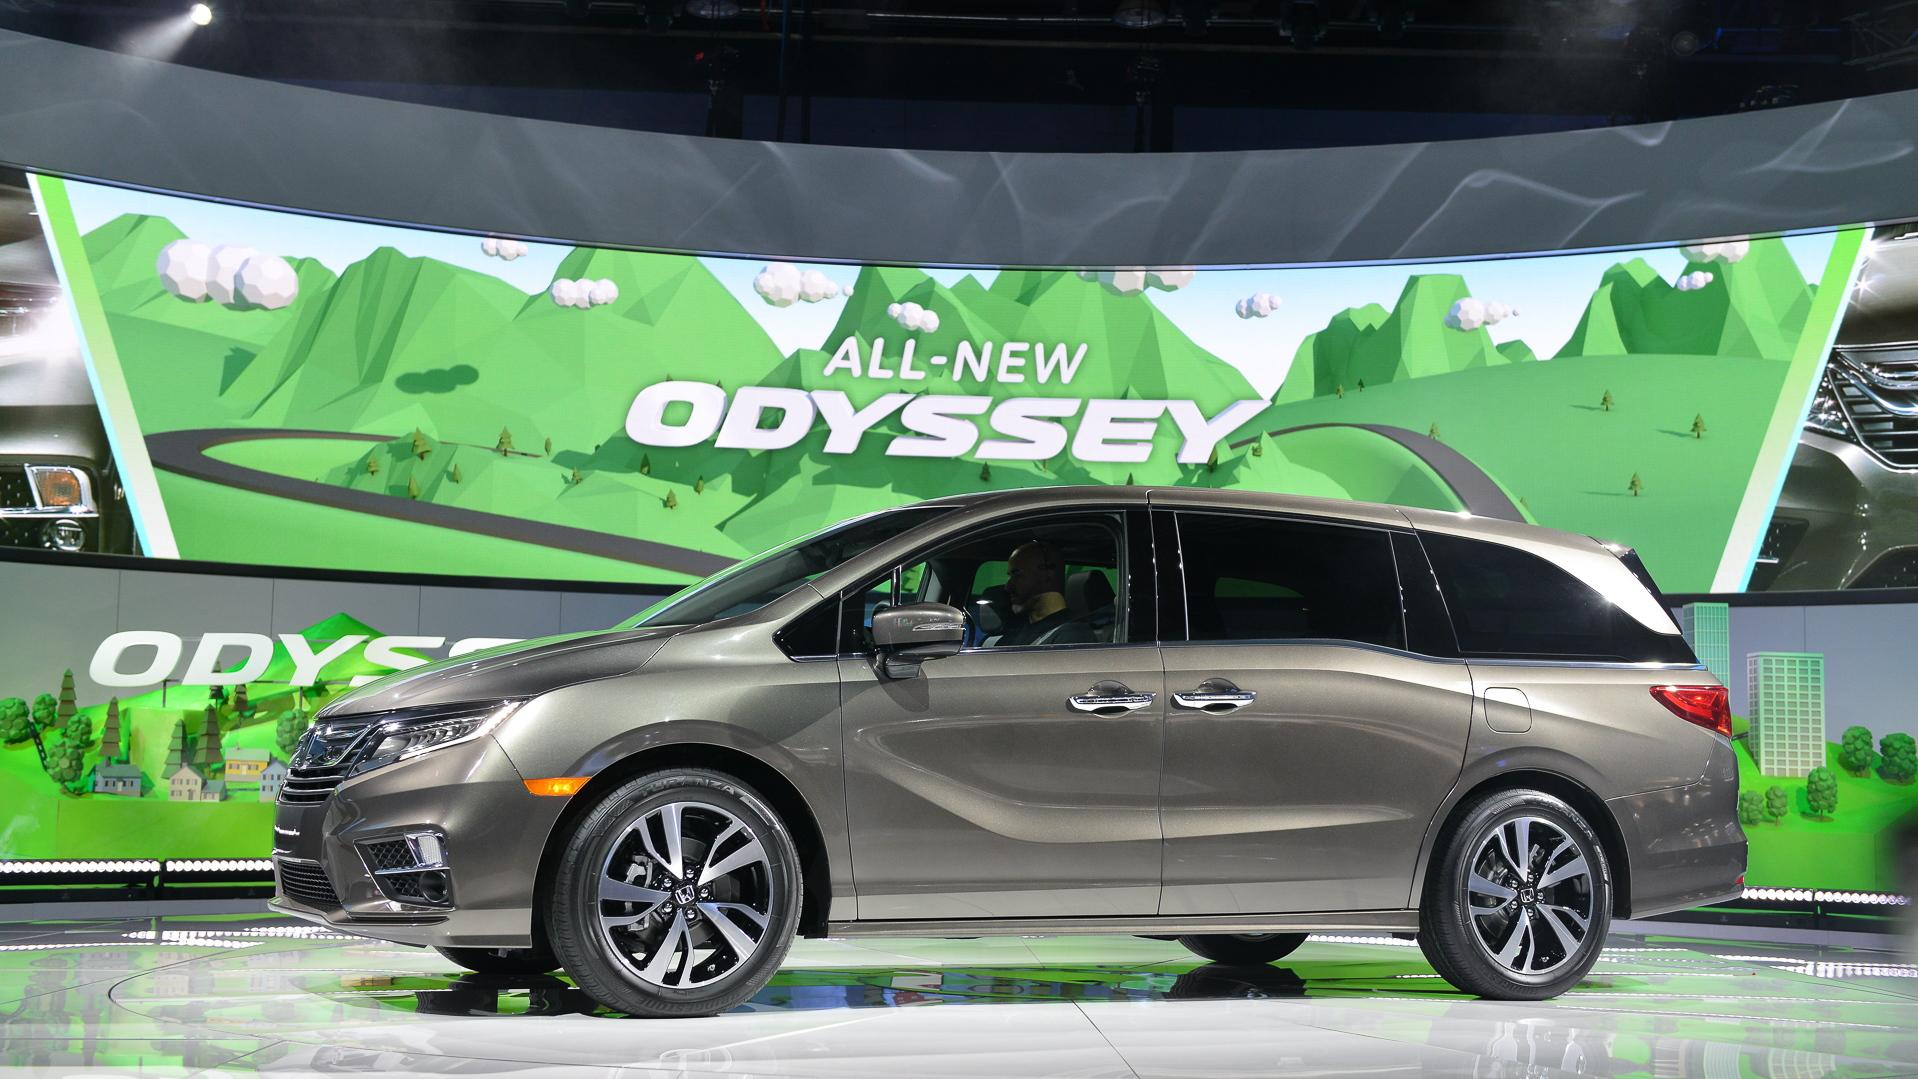 2018 Honda Odyssey, 2017 Detroit auto show